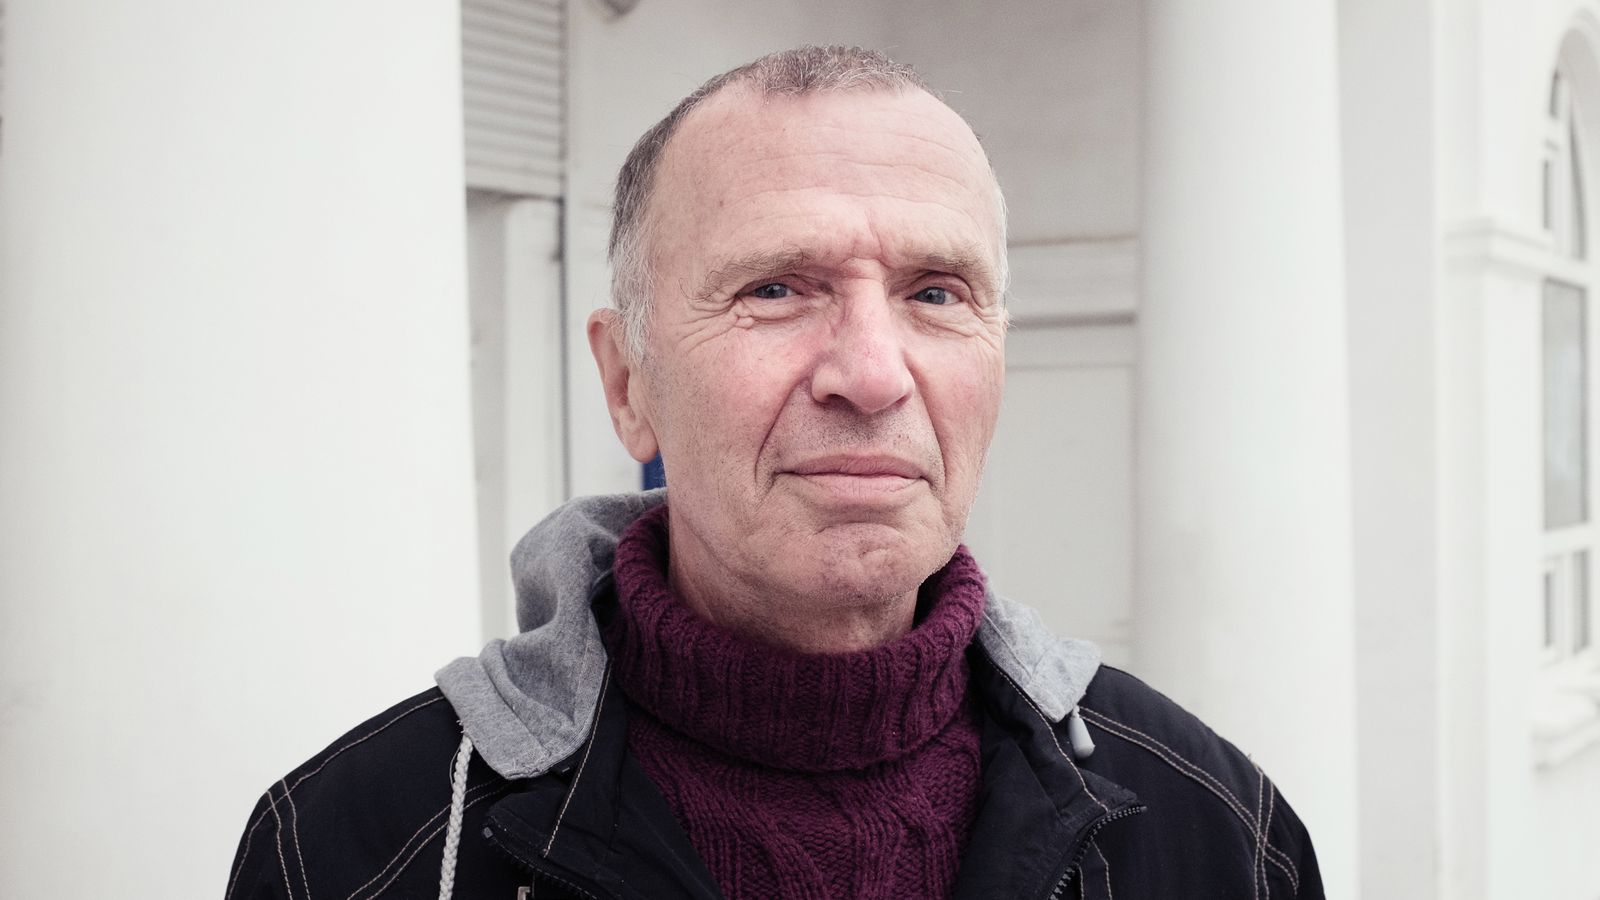 Vladimir_Uglev_AB_13.JPG-1